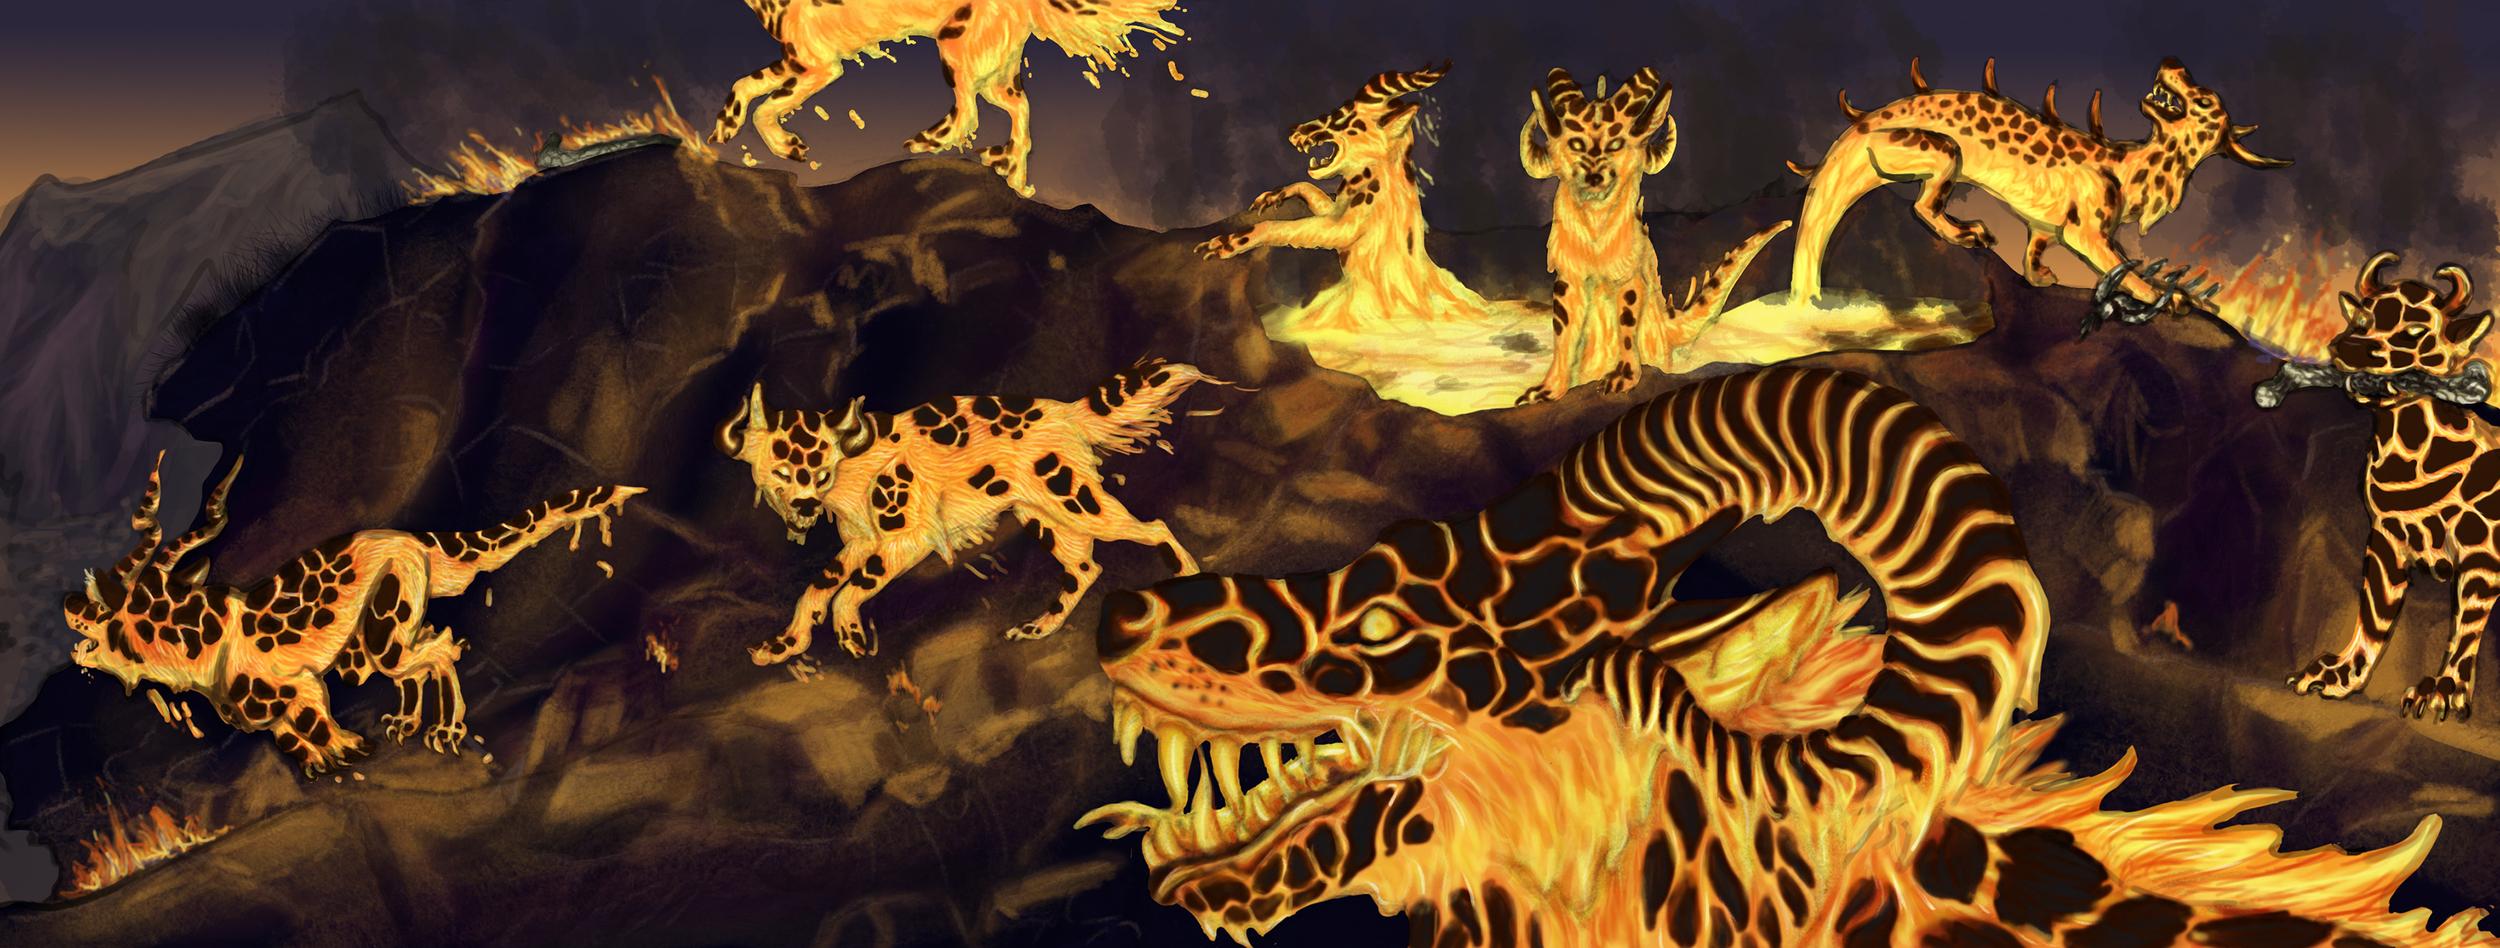 Lavawolffinal2.jpg